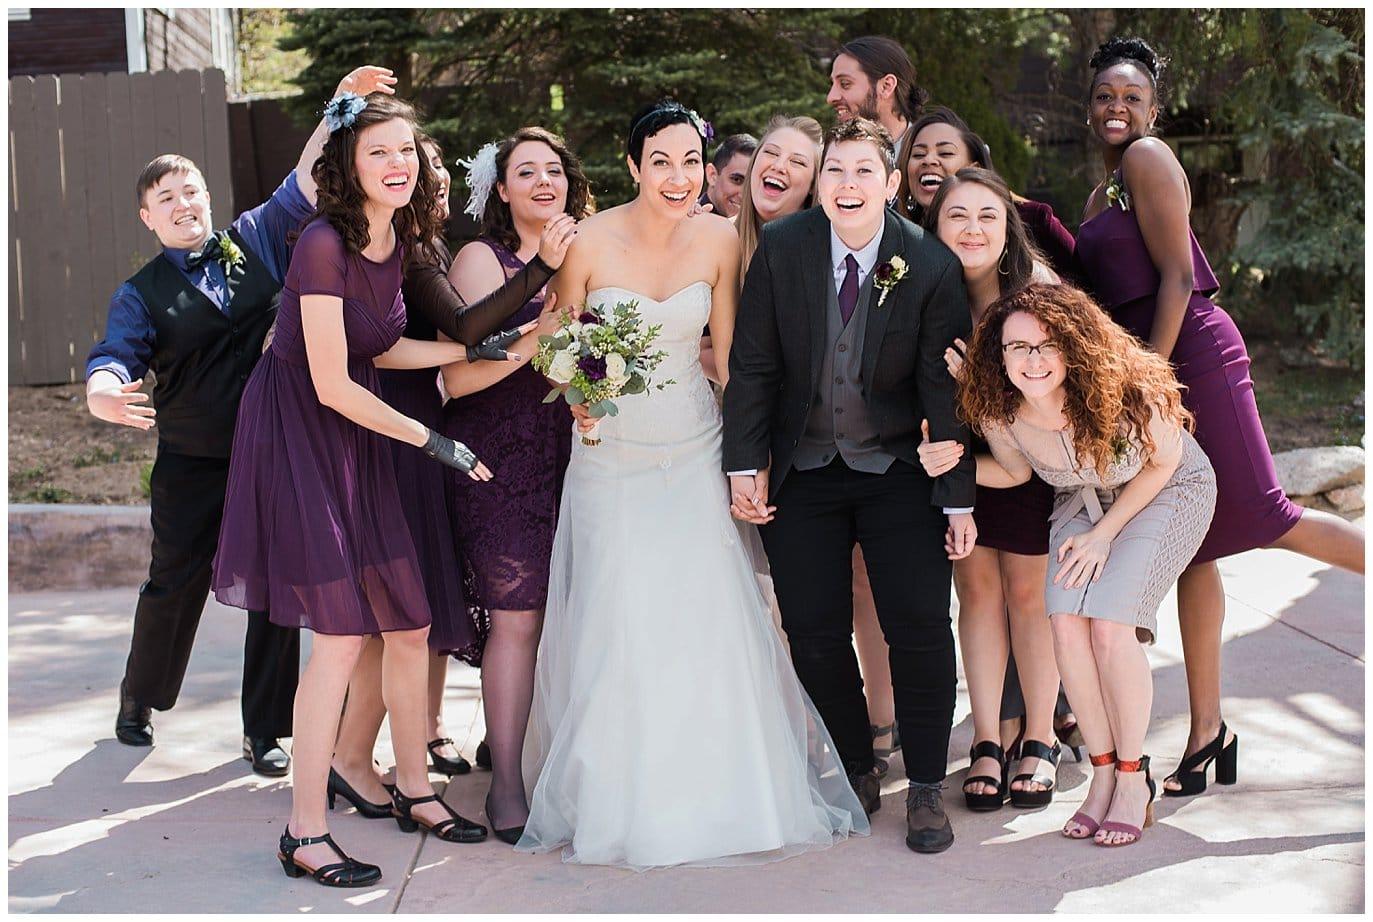 Fun bridal party at LGBT colorado wedding photo